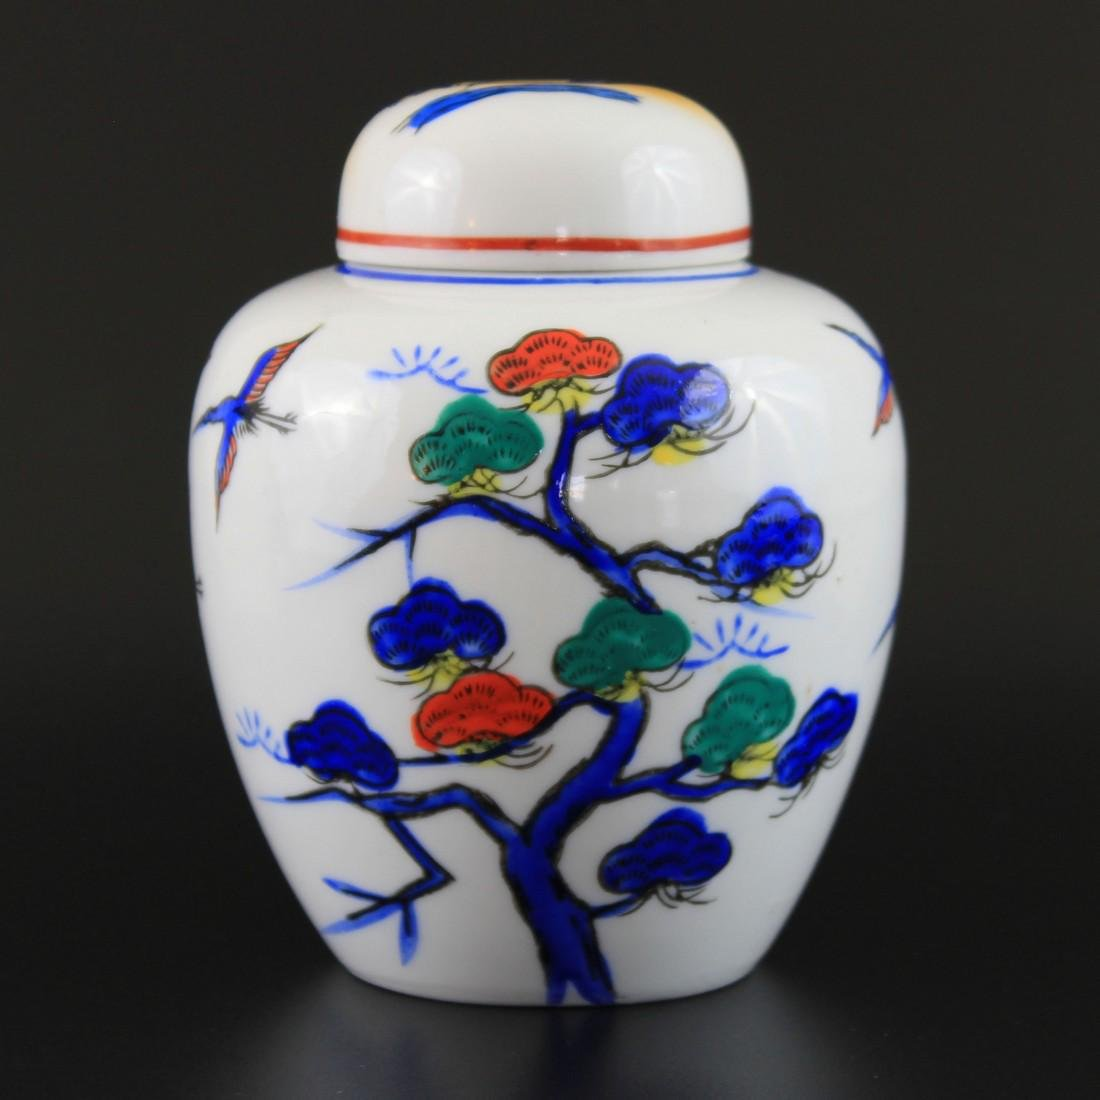 Vintage Seymour Mann Raised Enamel Porcelain Ginger Jar